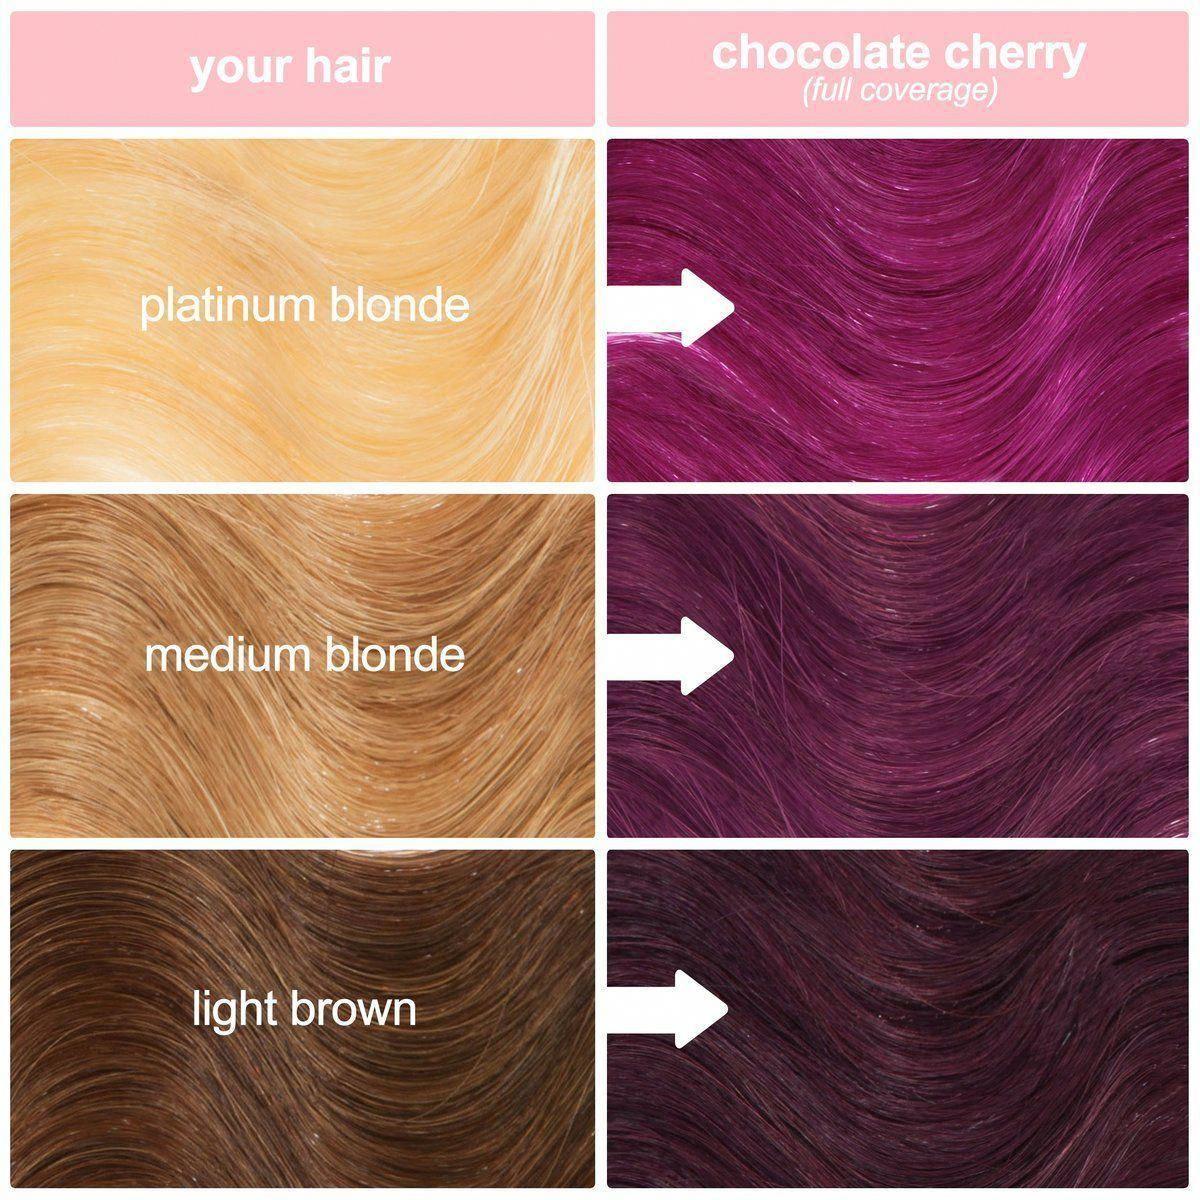 Chocolate Cherry Red Burgundy Vegan Semi Permanent Hair Dye Lime Crime Unicornhair Camb Tintes De Cabello Rojo Tintes De Cabello Colores De Cabello Mechas